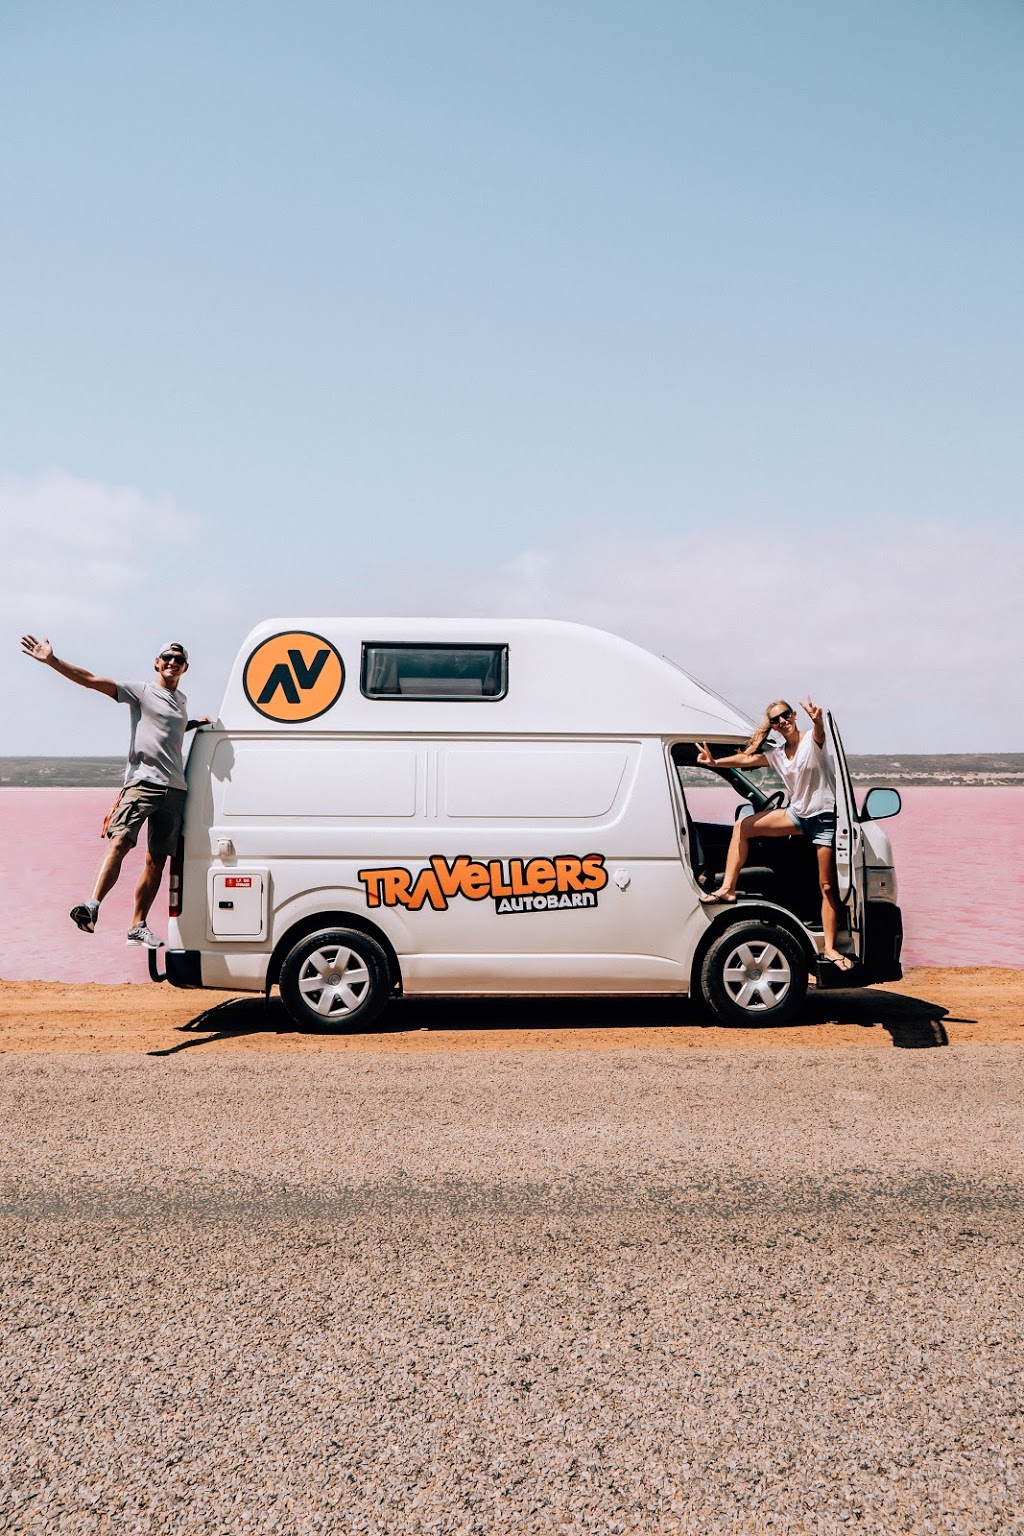 Travellers Autobarn Campervan Hire Perth - Car rental   16 ...